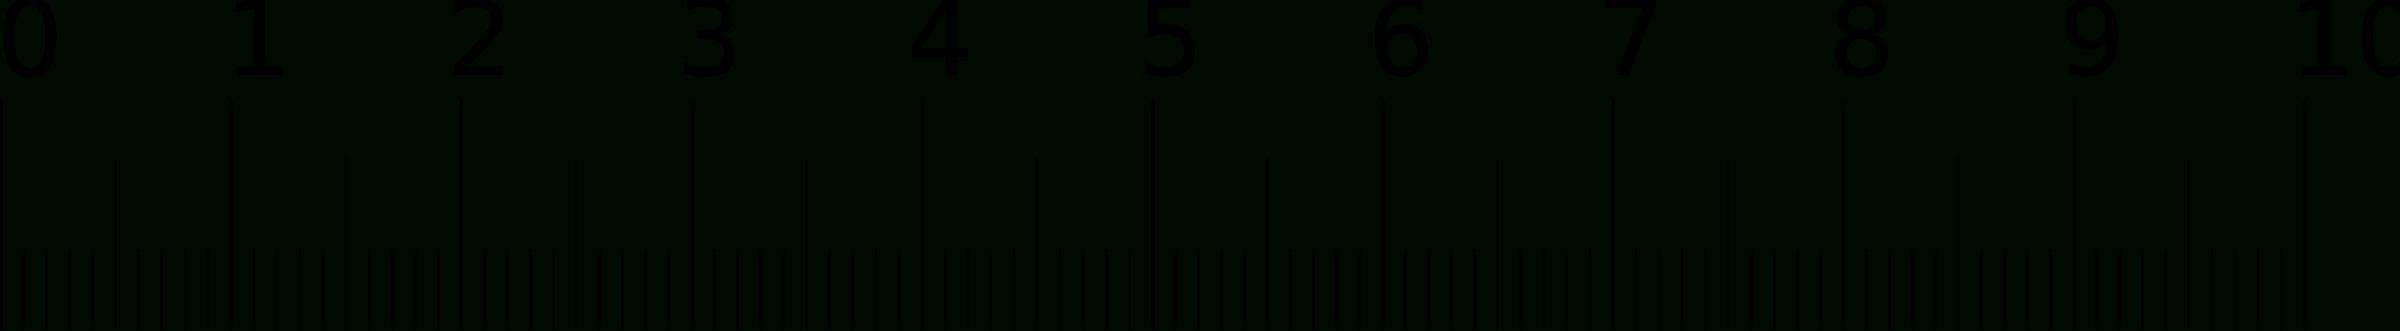 Vector Measure Ruler Transparent & Png Clipart Free Download